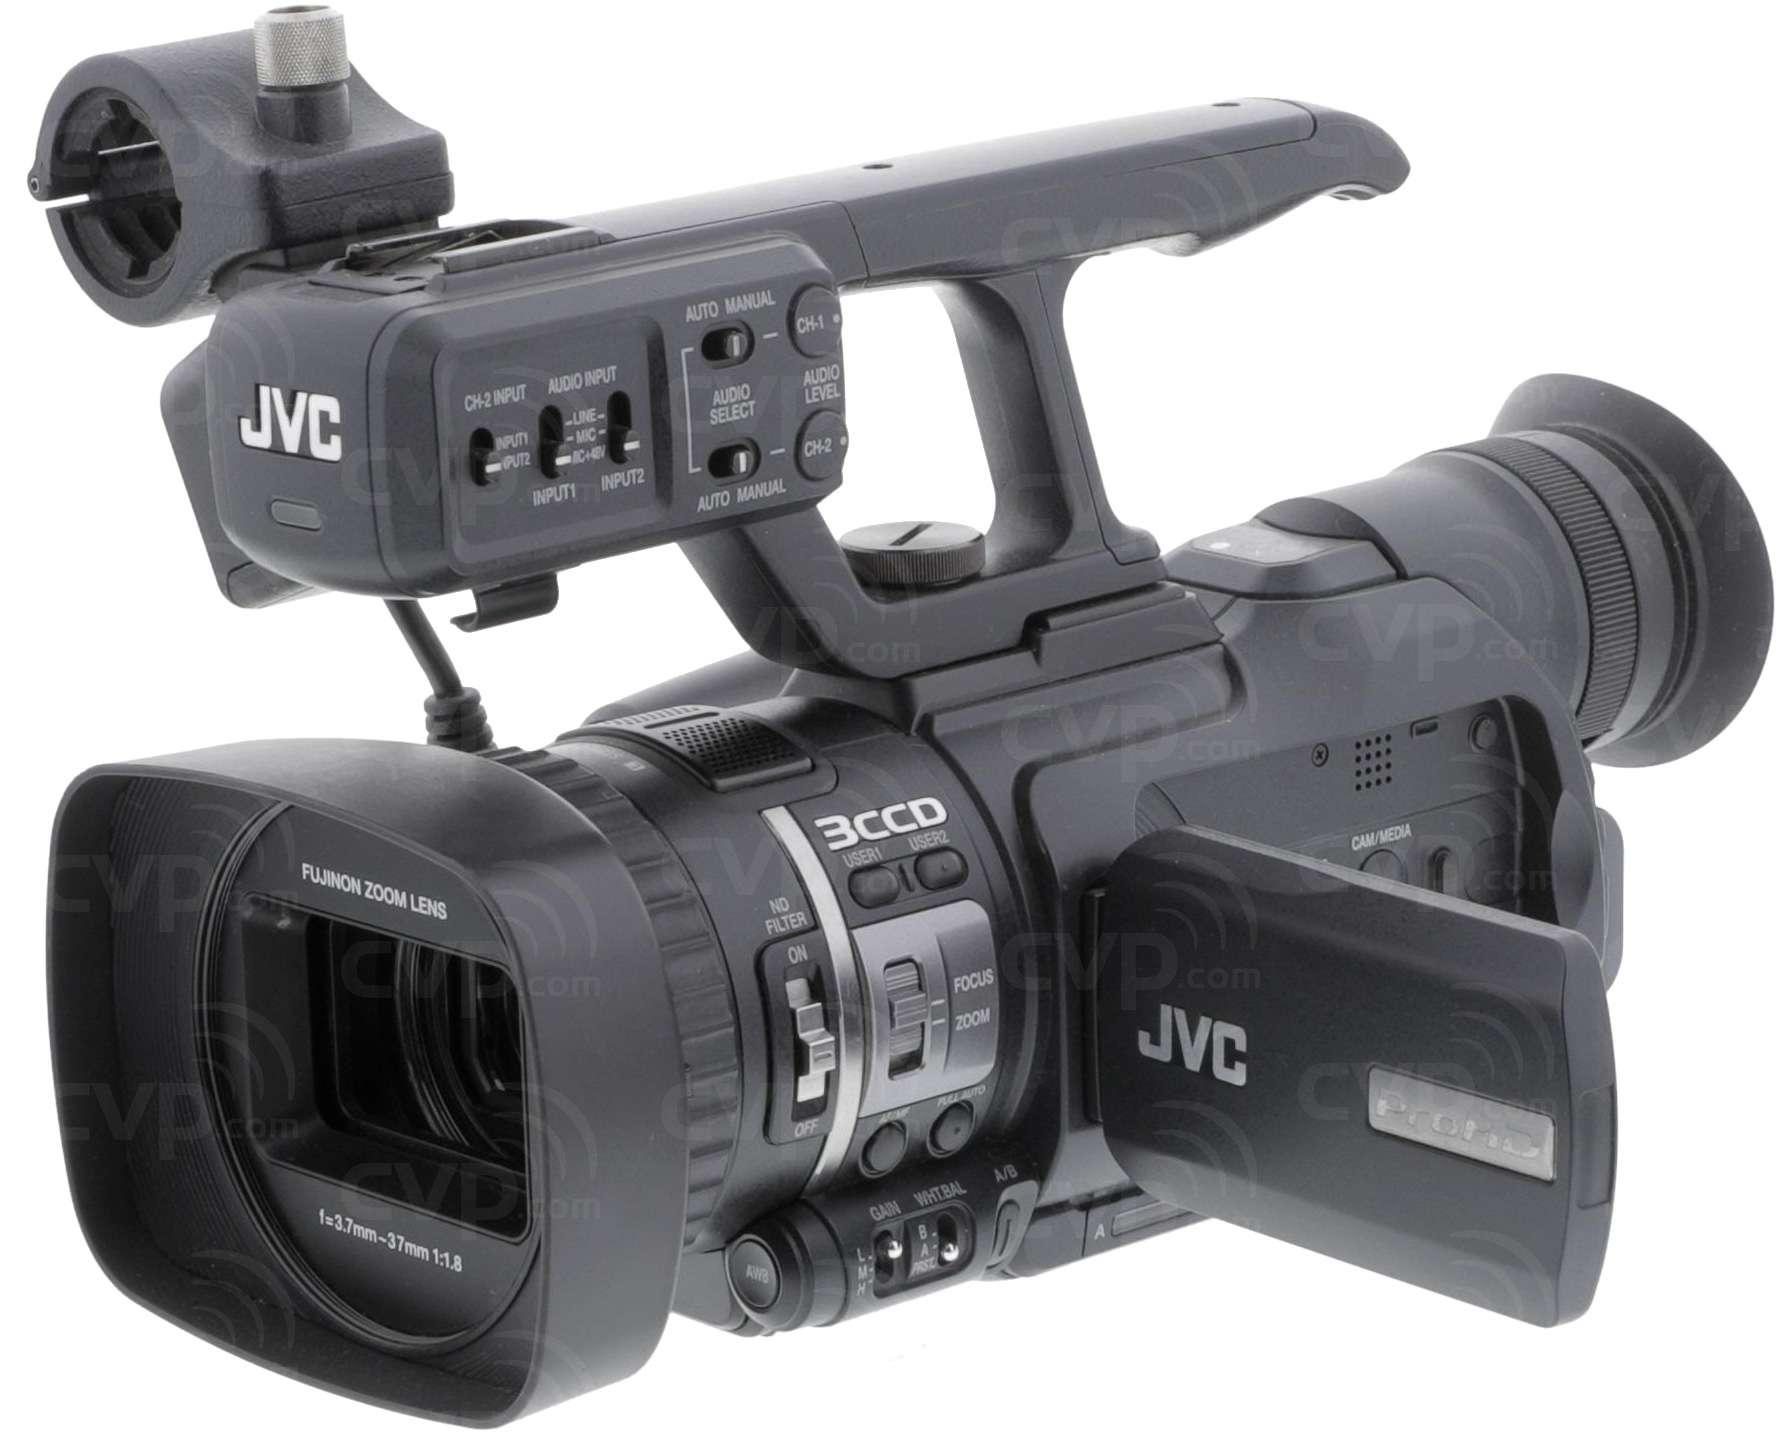 buy pre owned jvc gy hm100e gyhm100e gy hm100 prohd solid state rh cvp com jvc gy hm100u manual pdf jvc gy-hm100u prohd camcorder manual